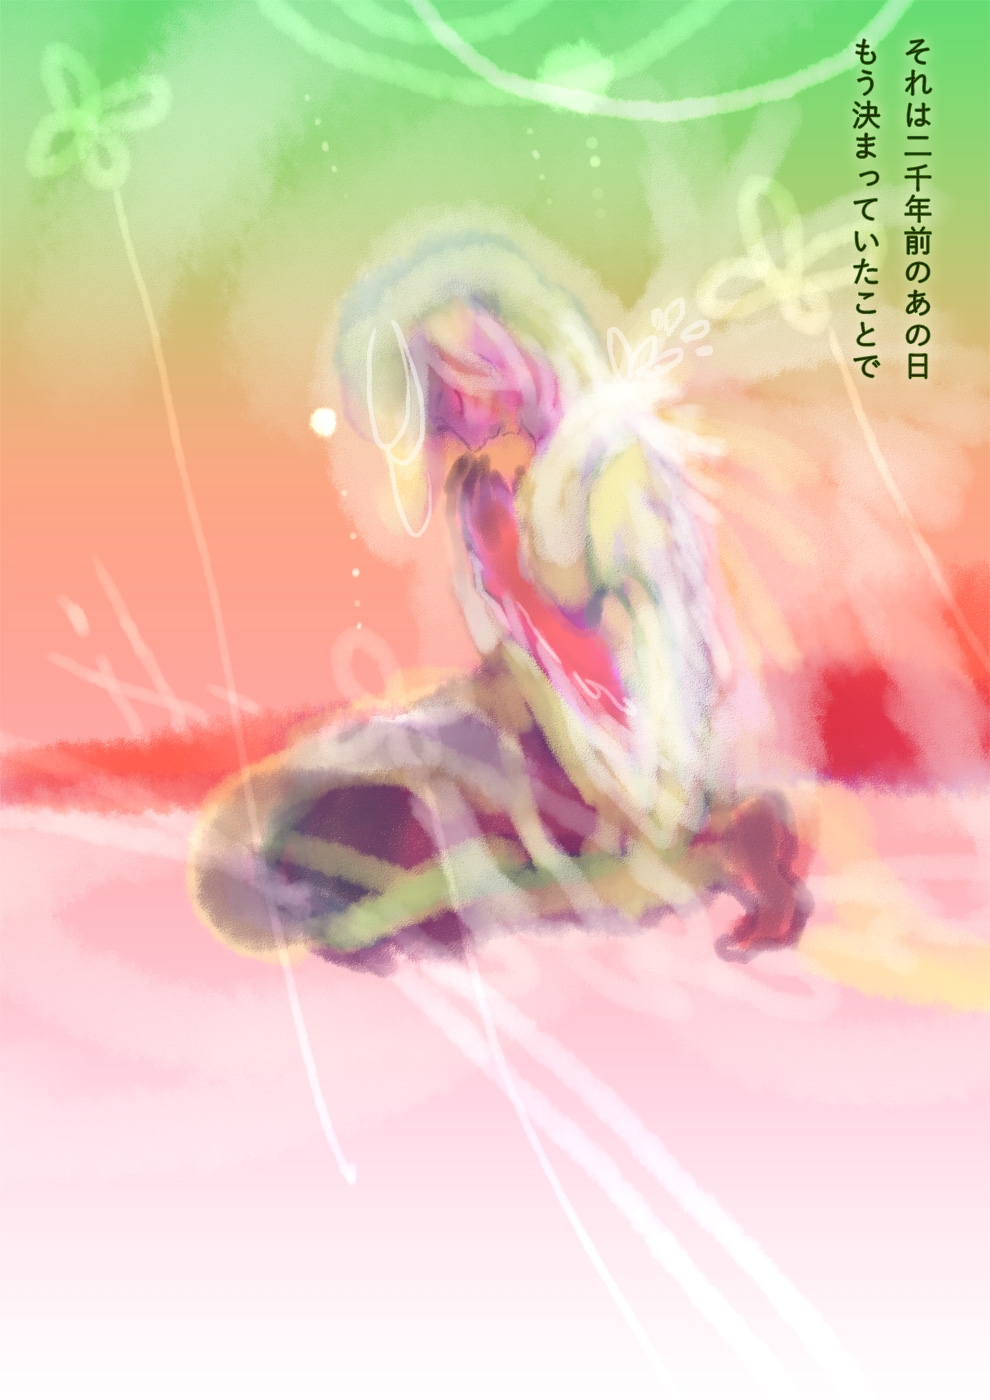 http://ahito.com/comic/ehon/kamiuta/img/2018/20180319/01.jpg